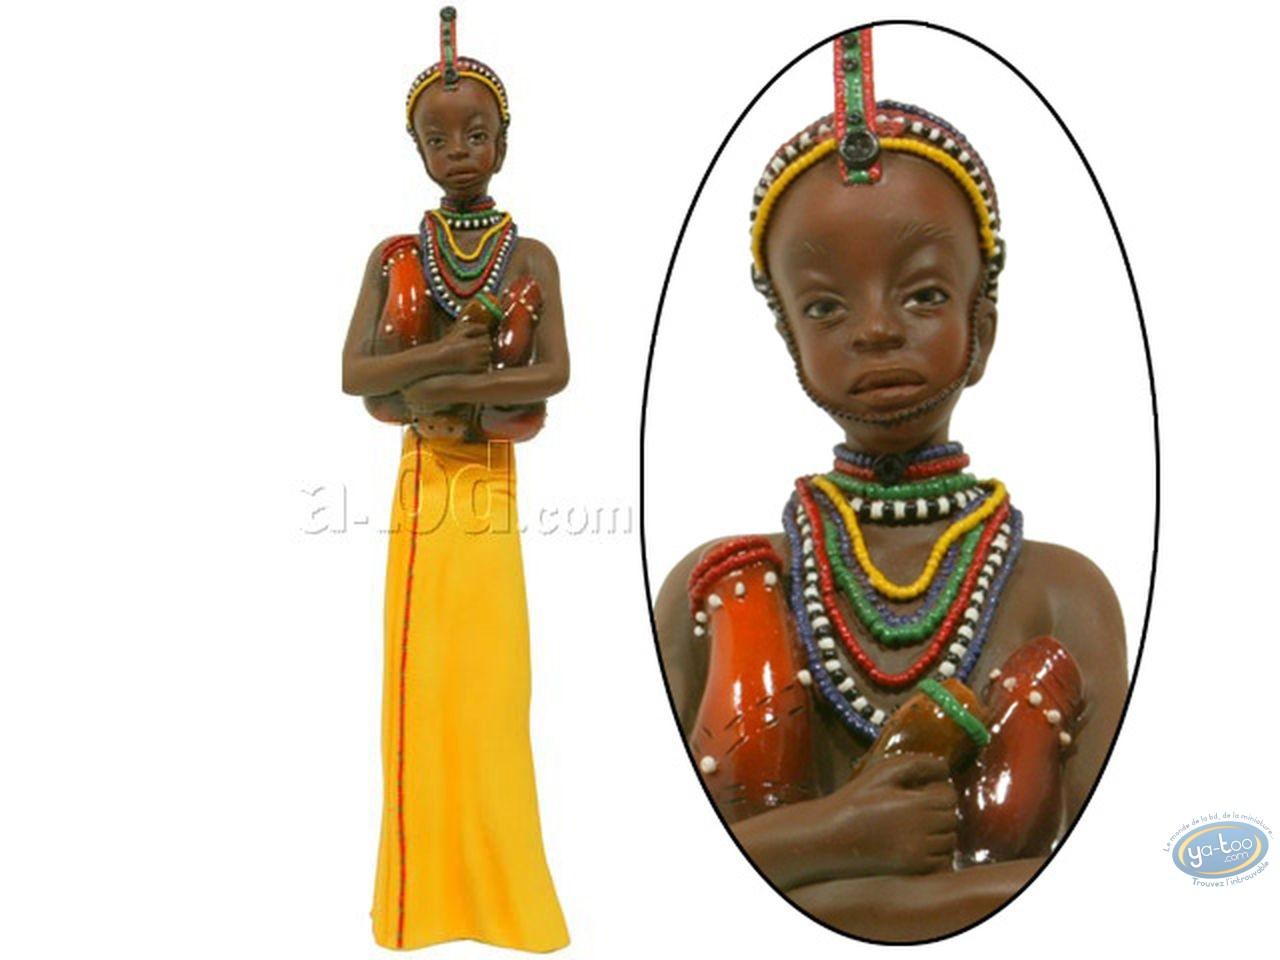 Resin Statuette, Safiya - au coeur pur